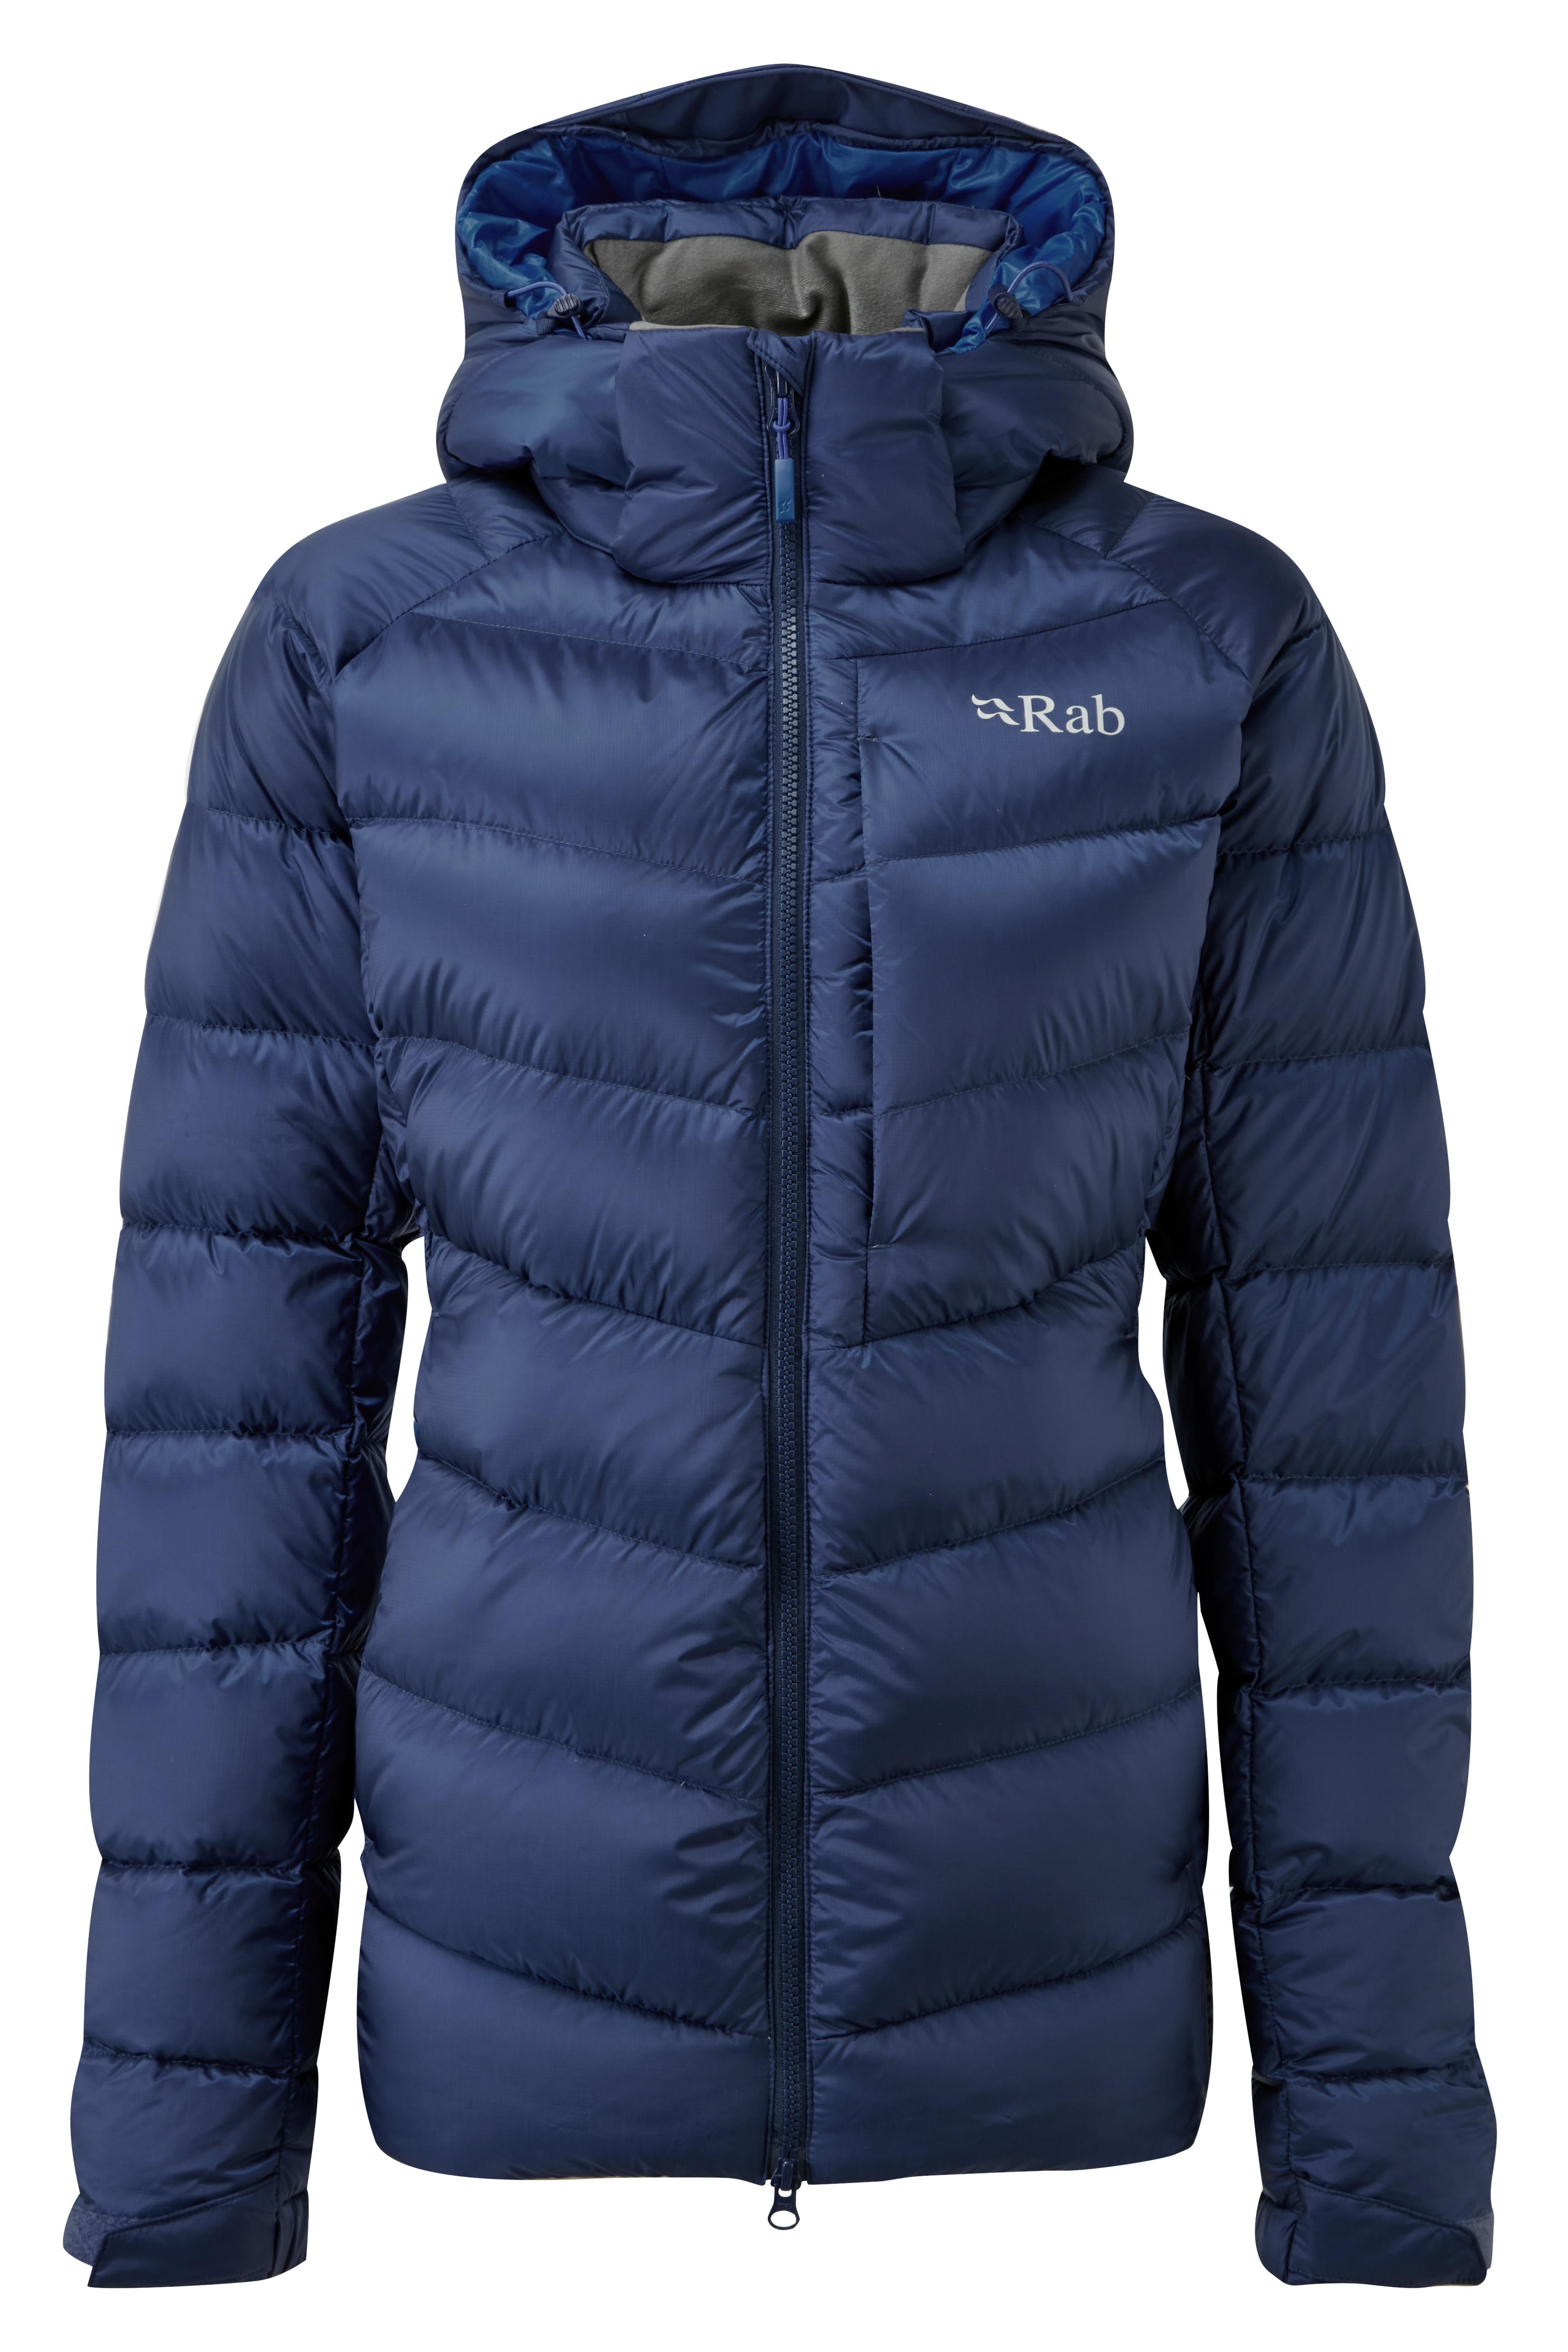 RAB Axion Pro Jacket, W's